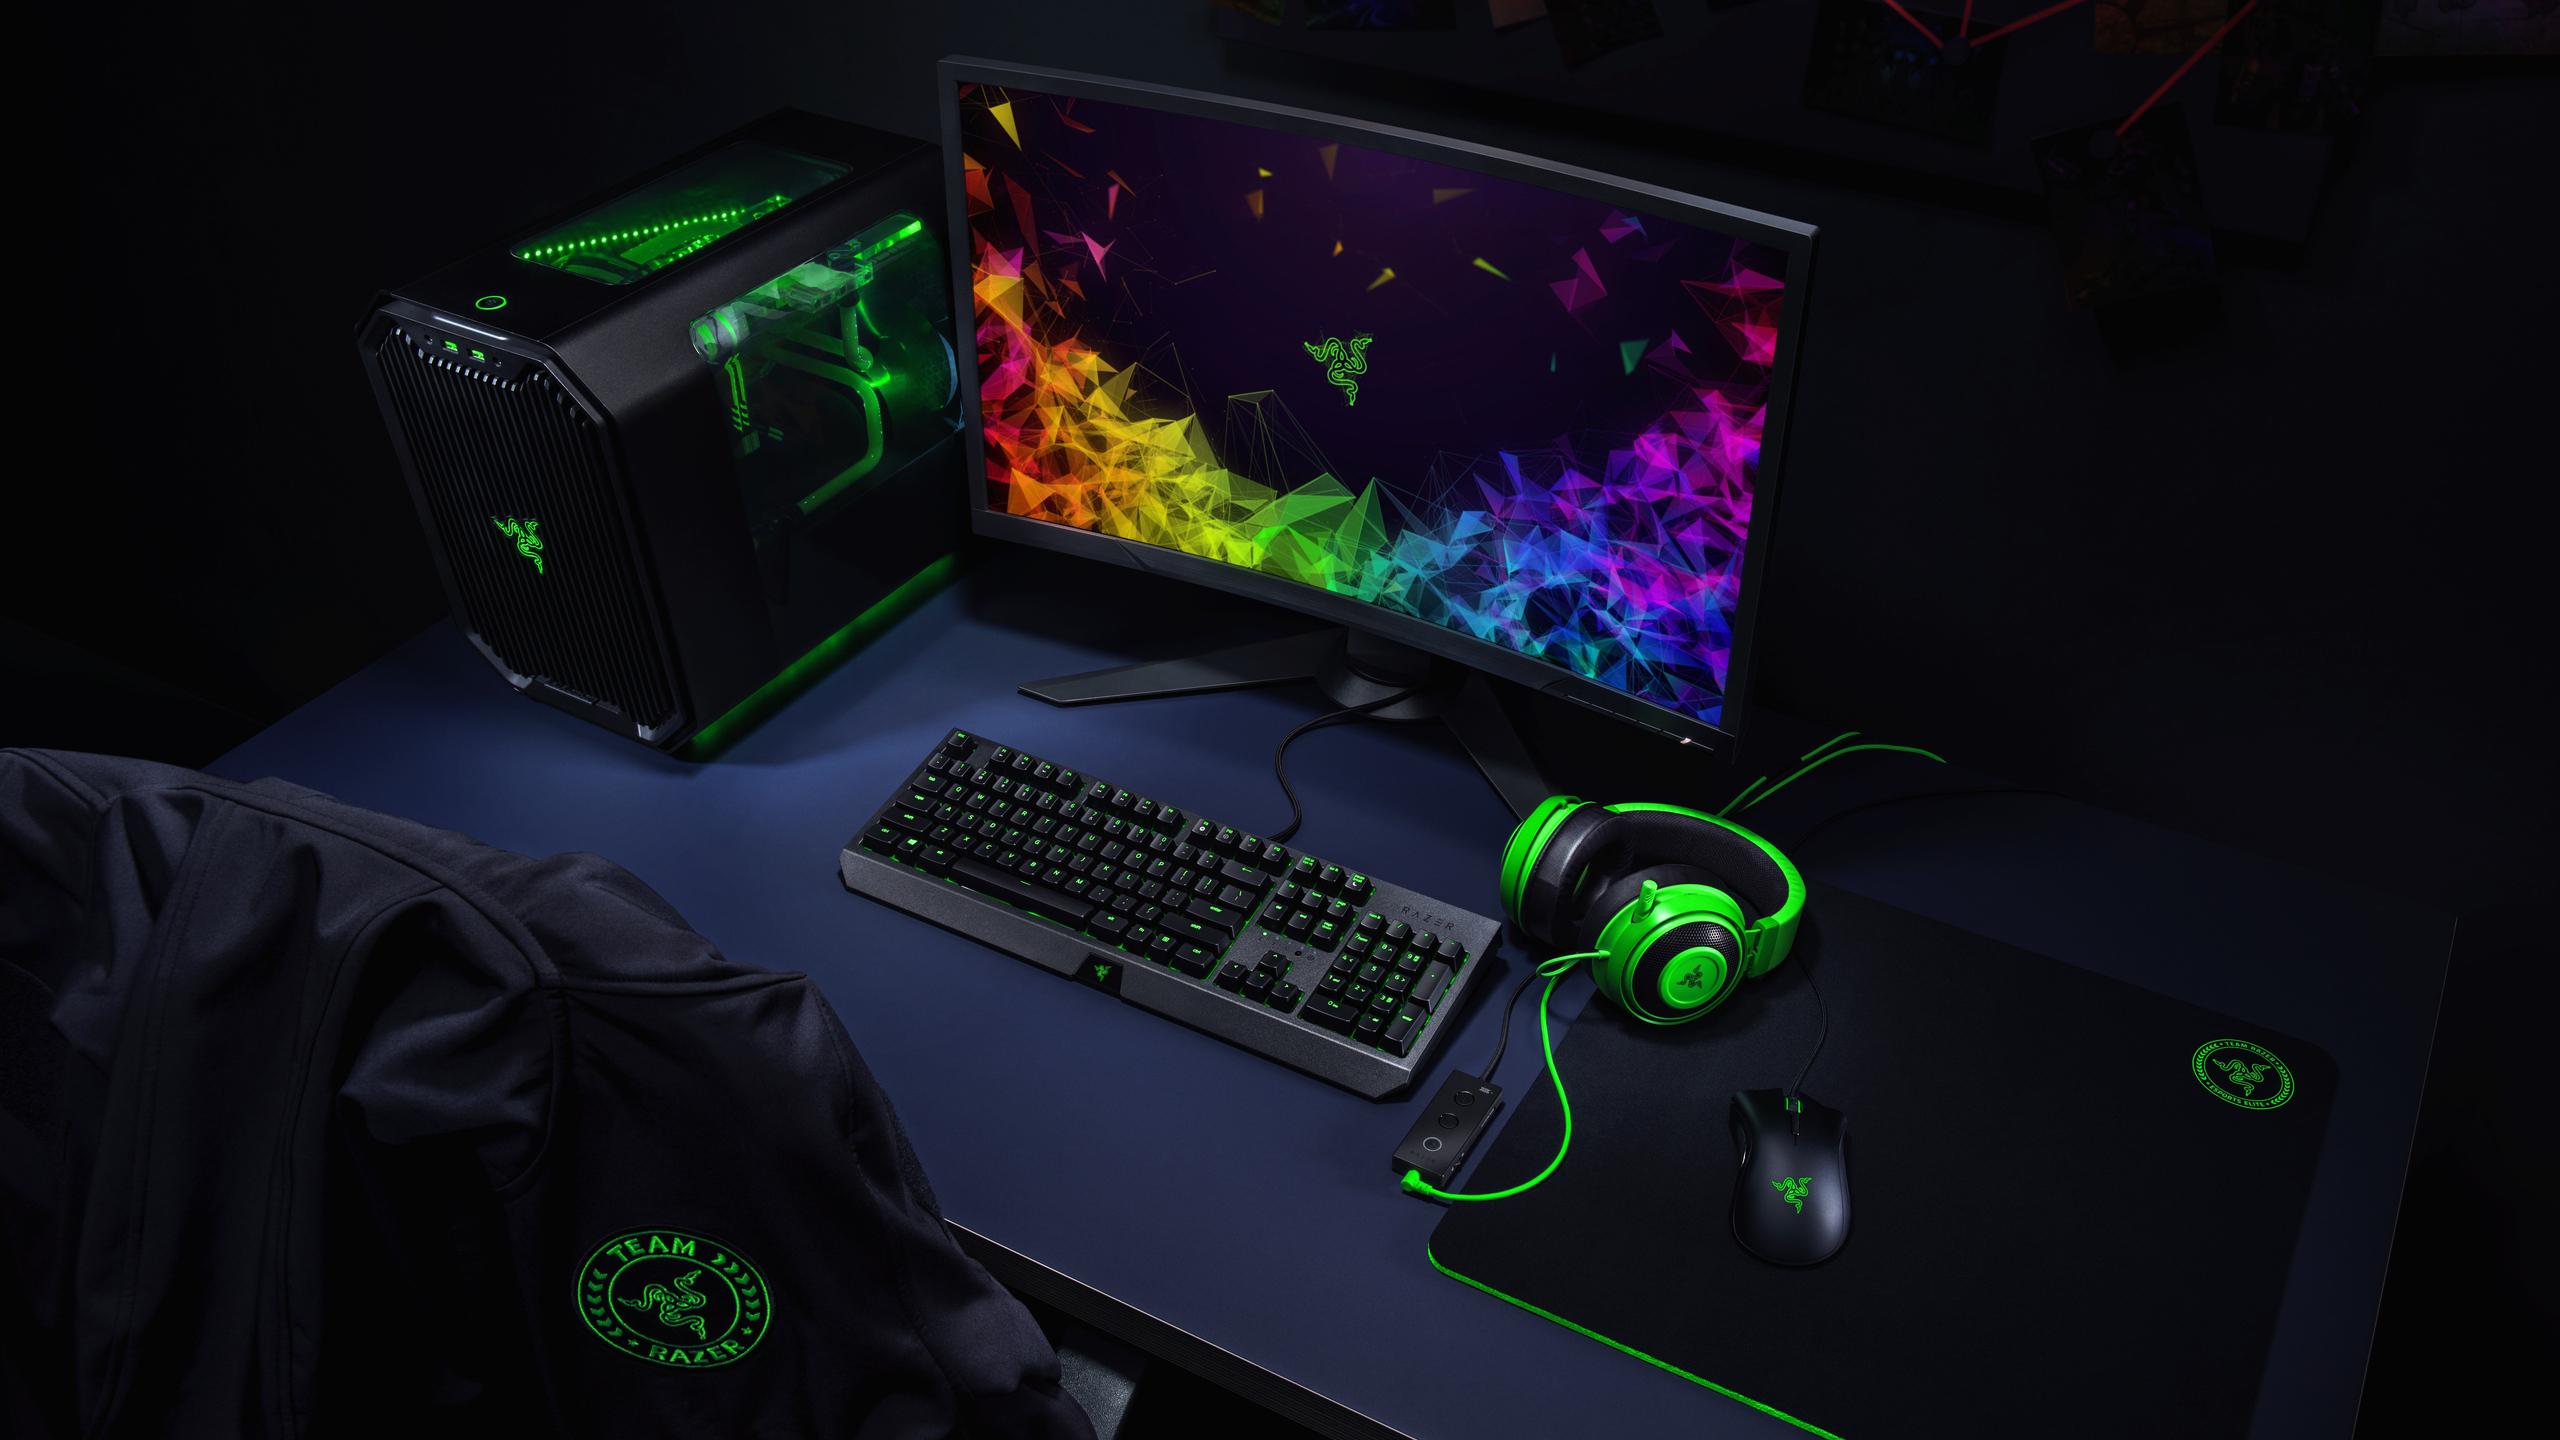 2560x1440 Razer Gaming Setup 8k 1440p Resolution Hd 4k